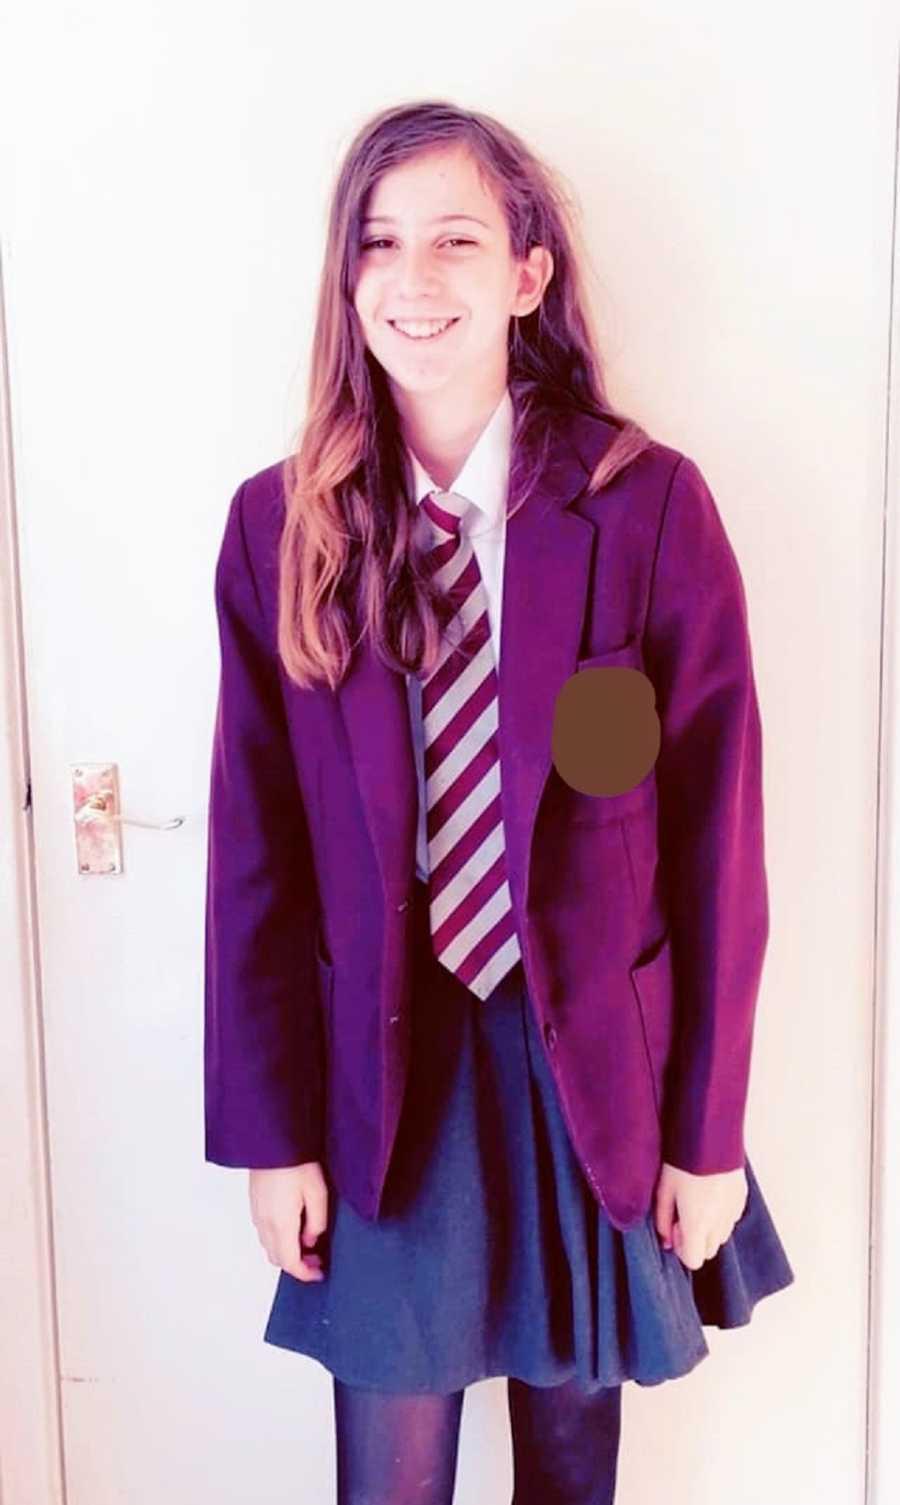 A child stands in a school uniform